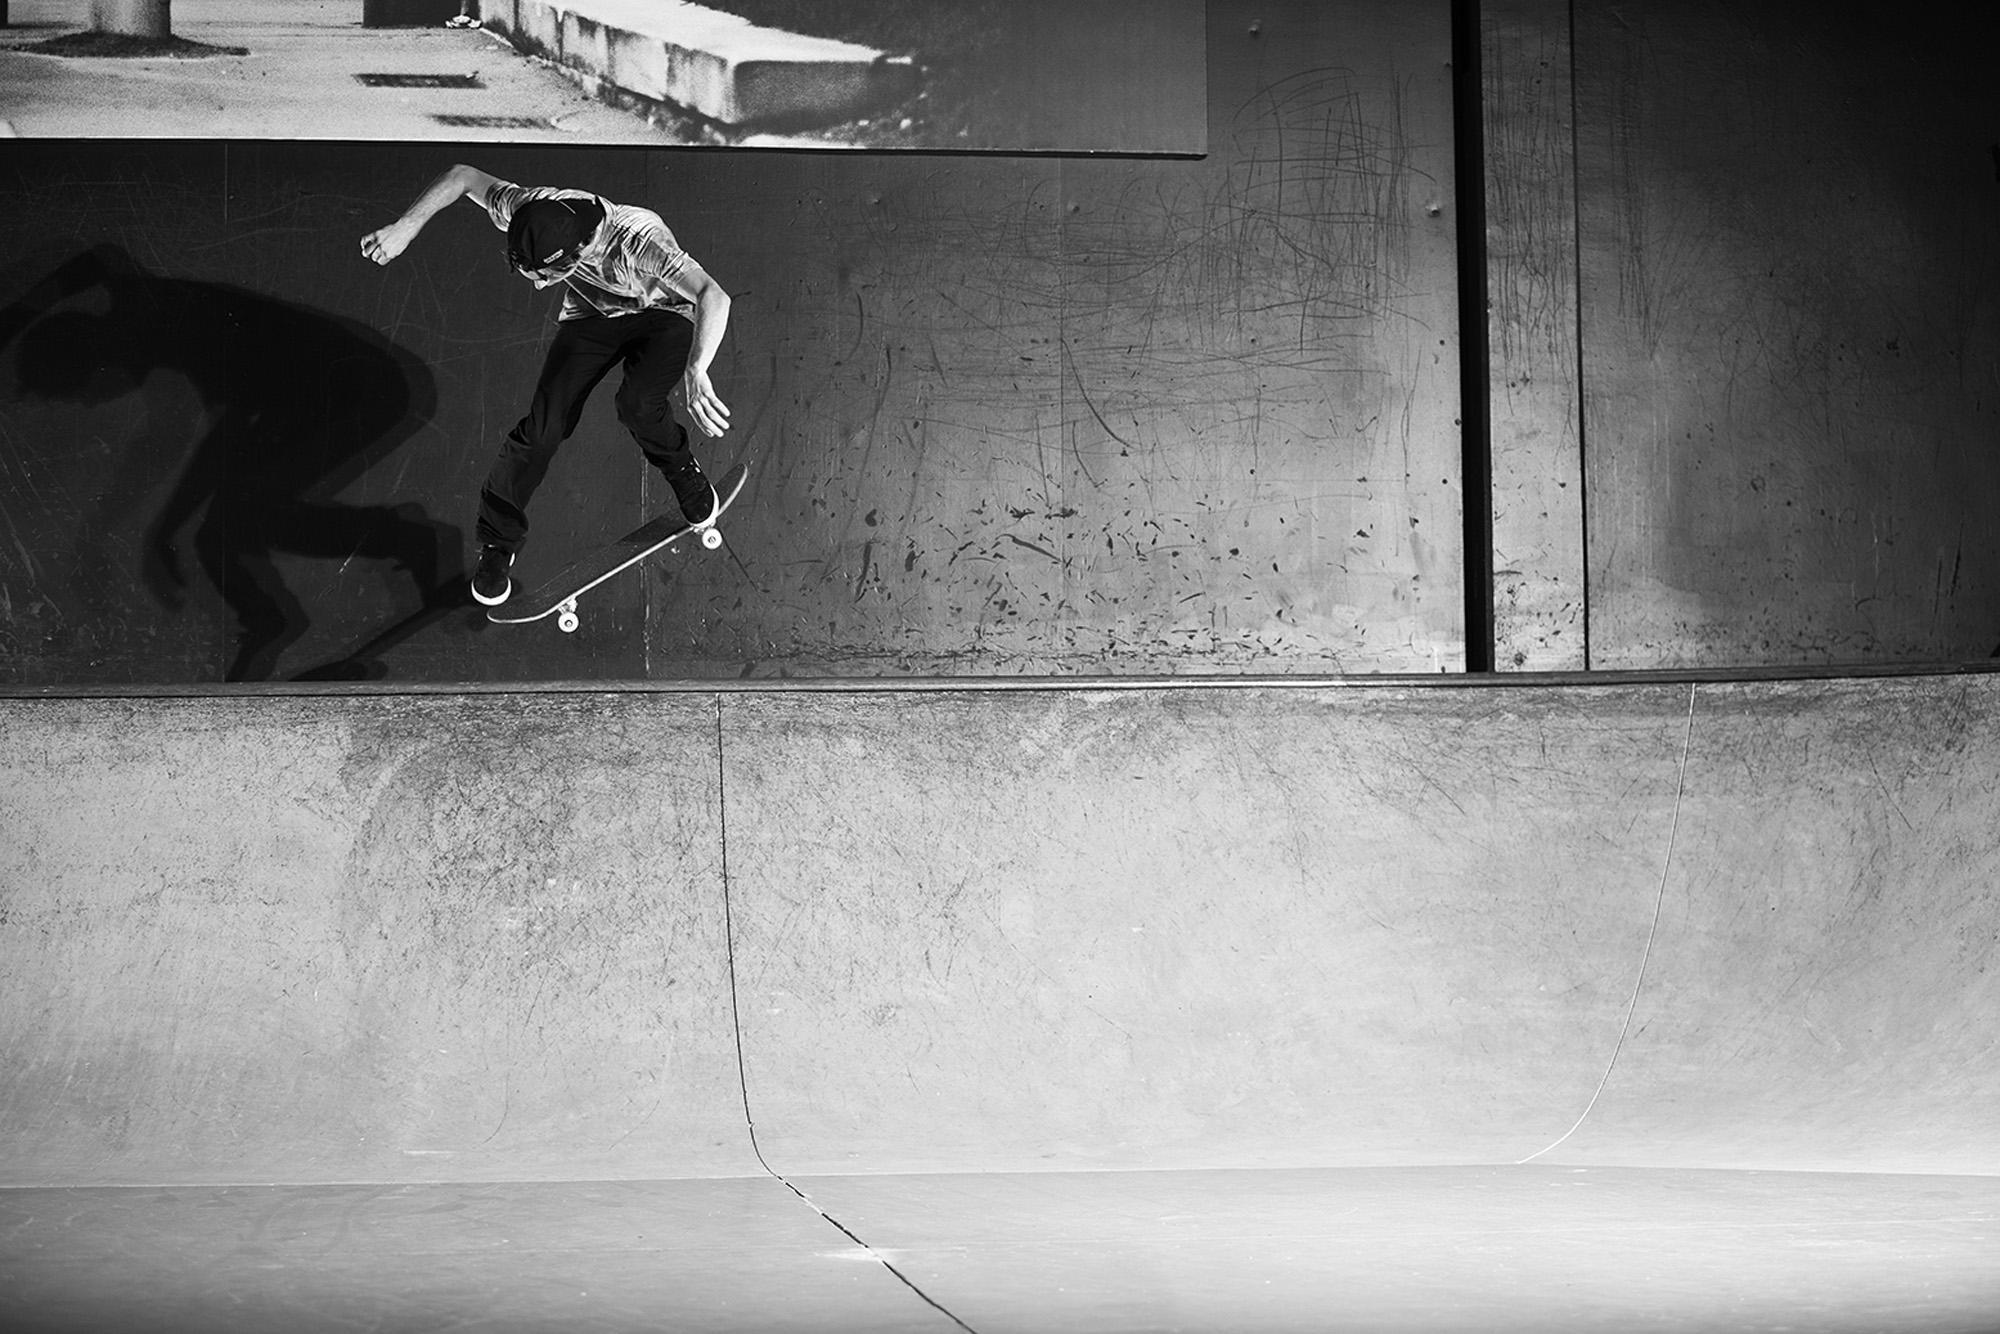 Tyson Bowerbank Almost Skateboards - The Berrics Recruit 9